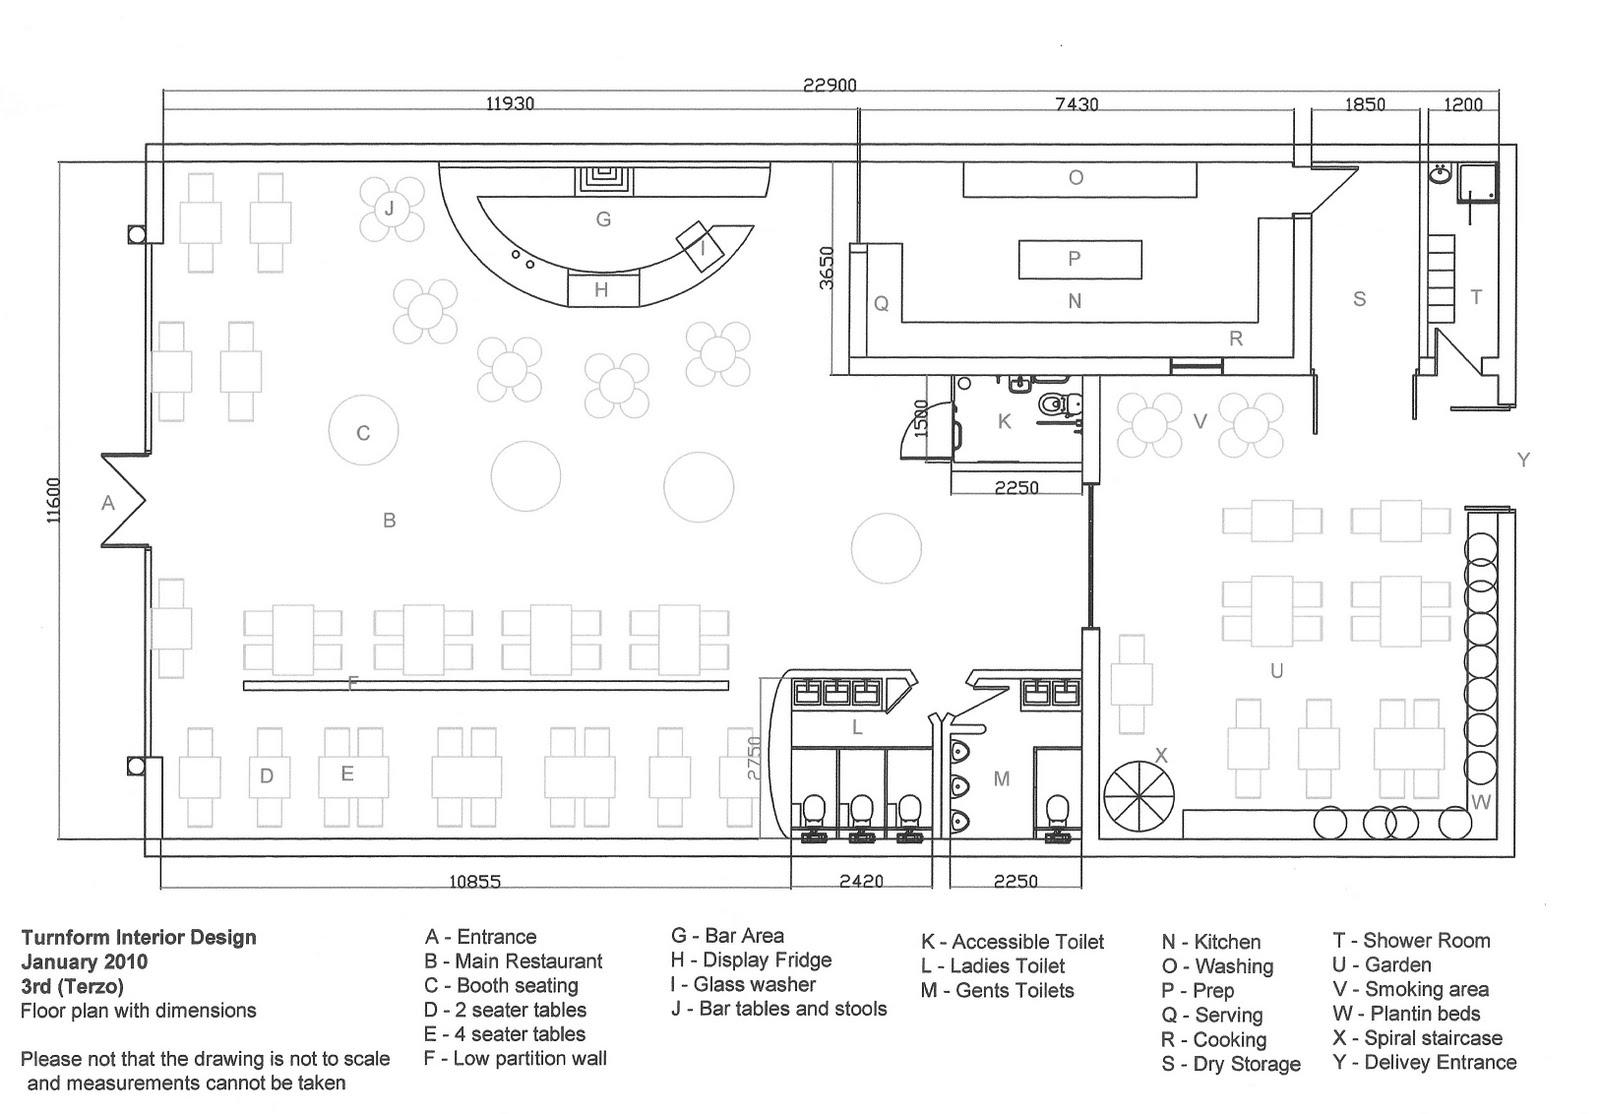 Lisa Tanzi Interior Designer Restaurant Project Schematic Newly Designed Plan 104 Covers